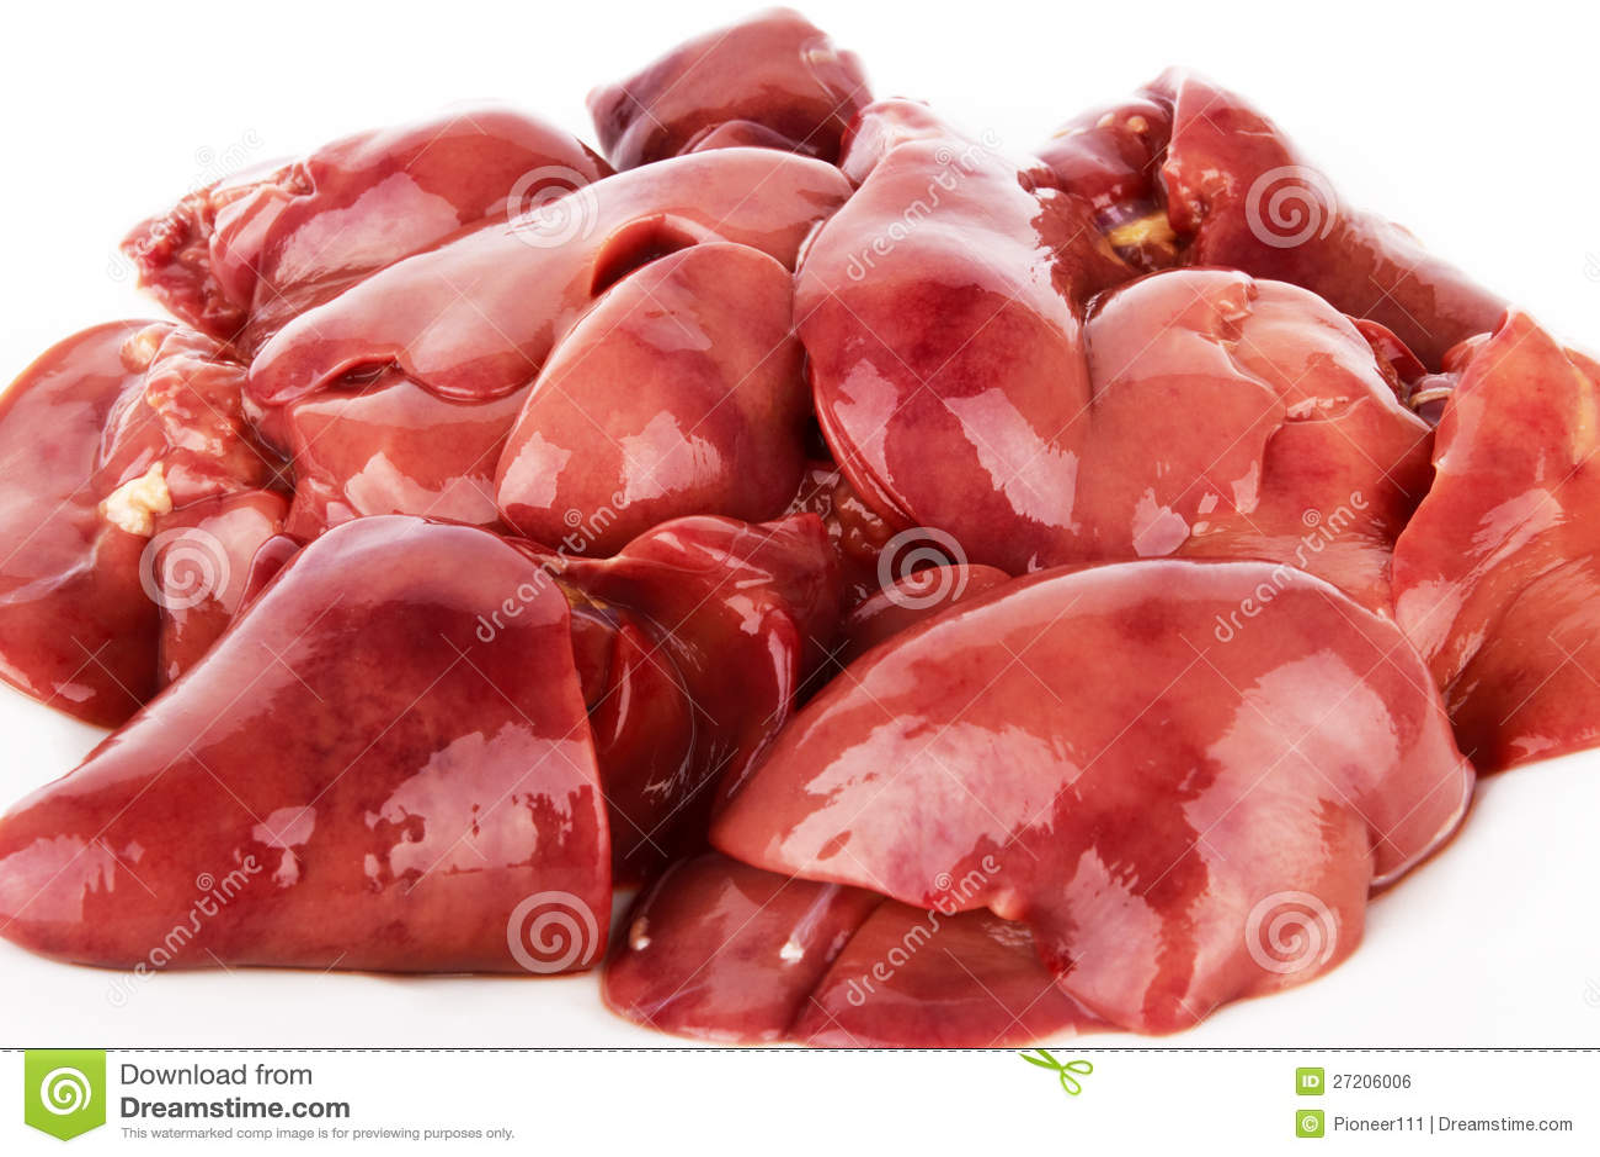 Hühnerleber